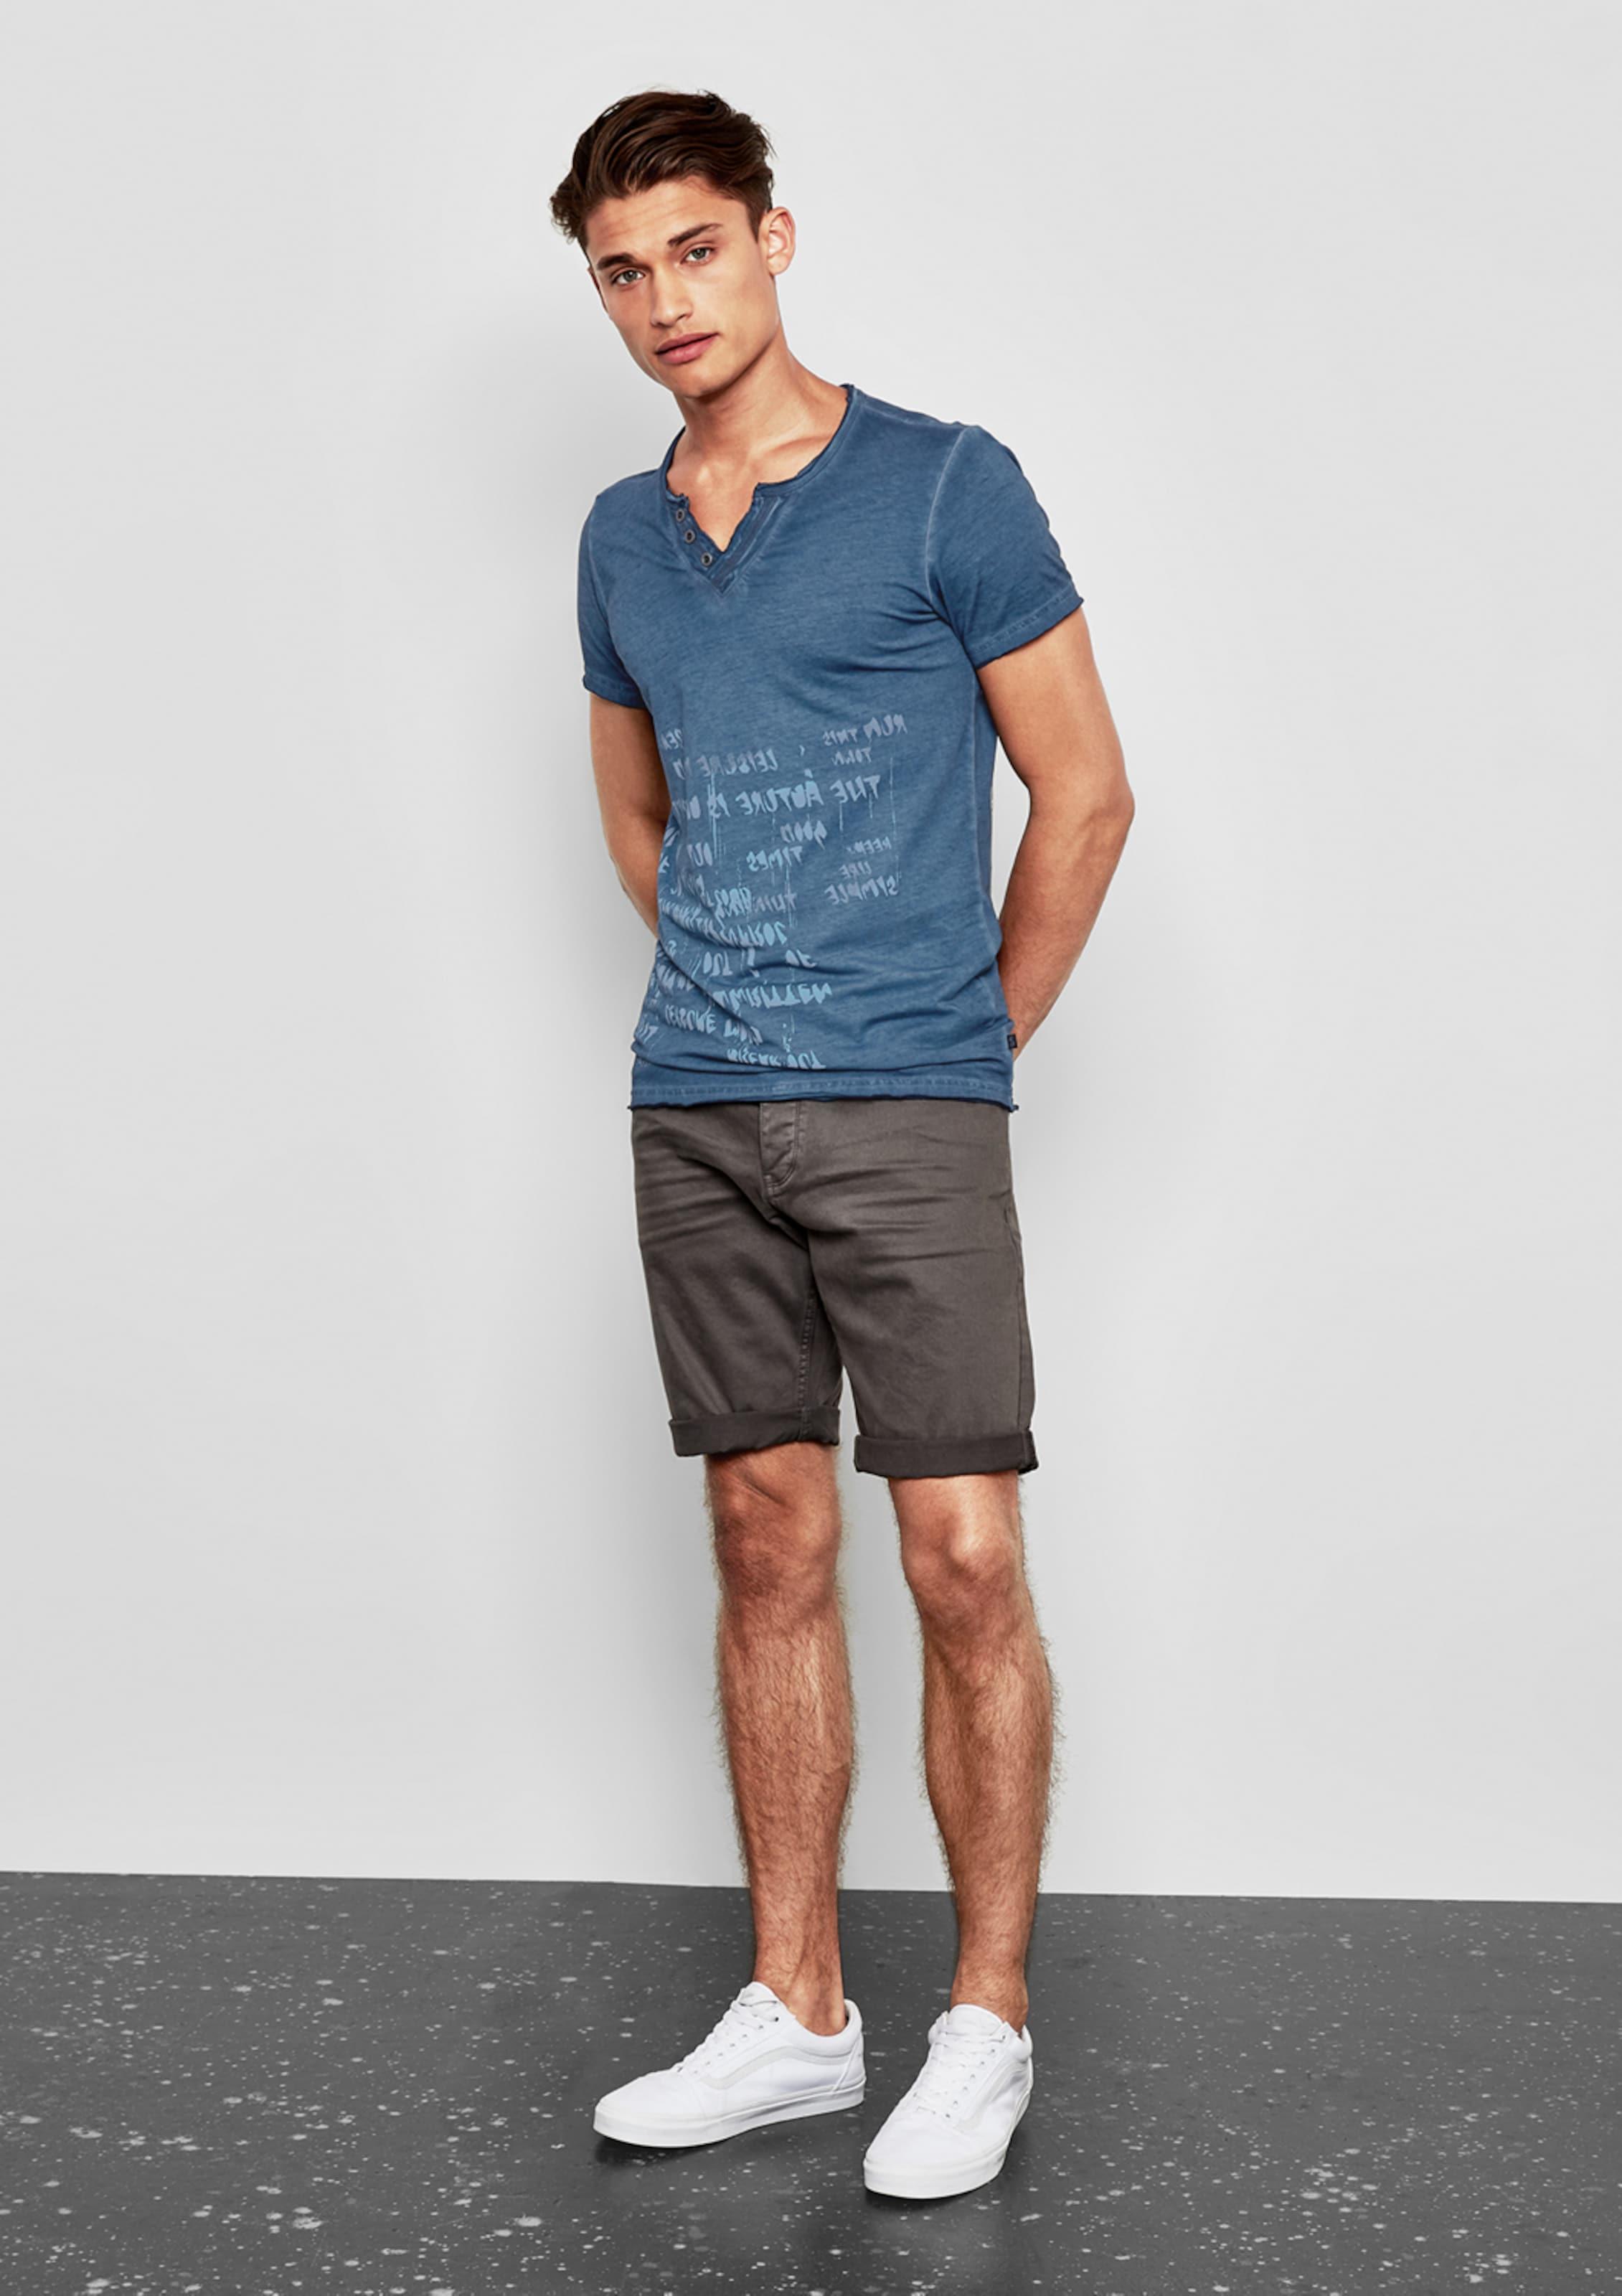 Blaumeliert Designed Q s By In Shirt Y6gv7ybf